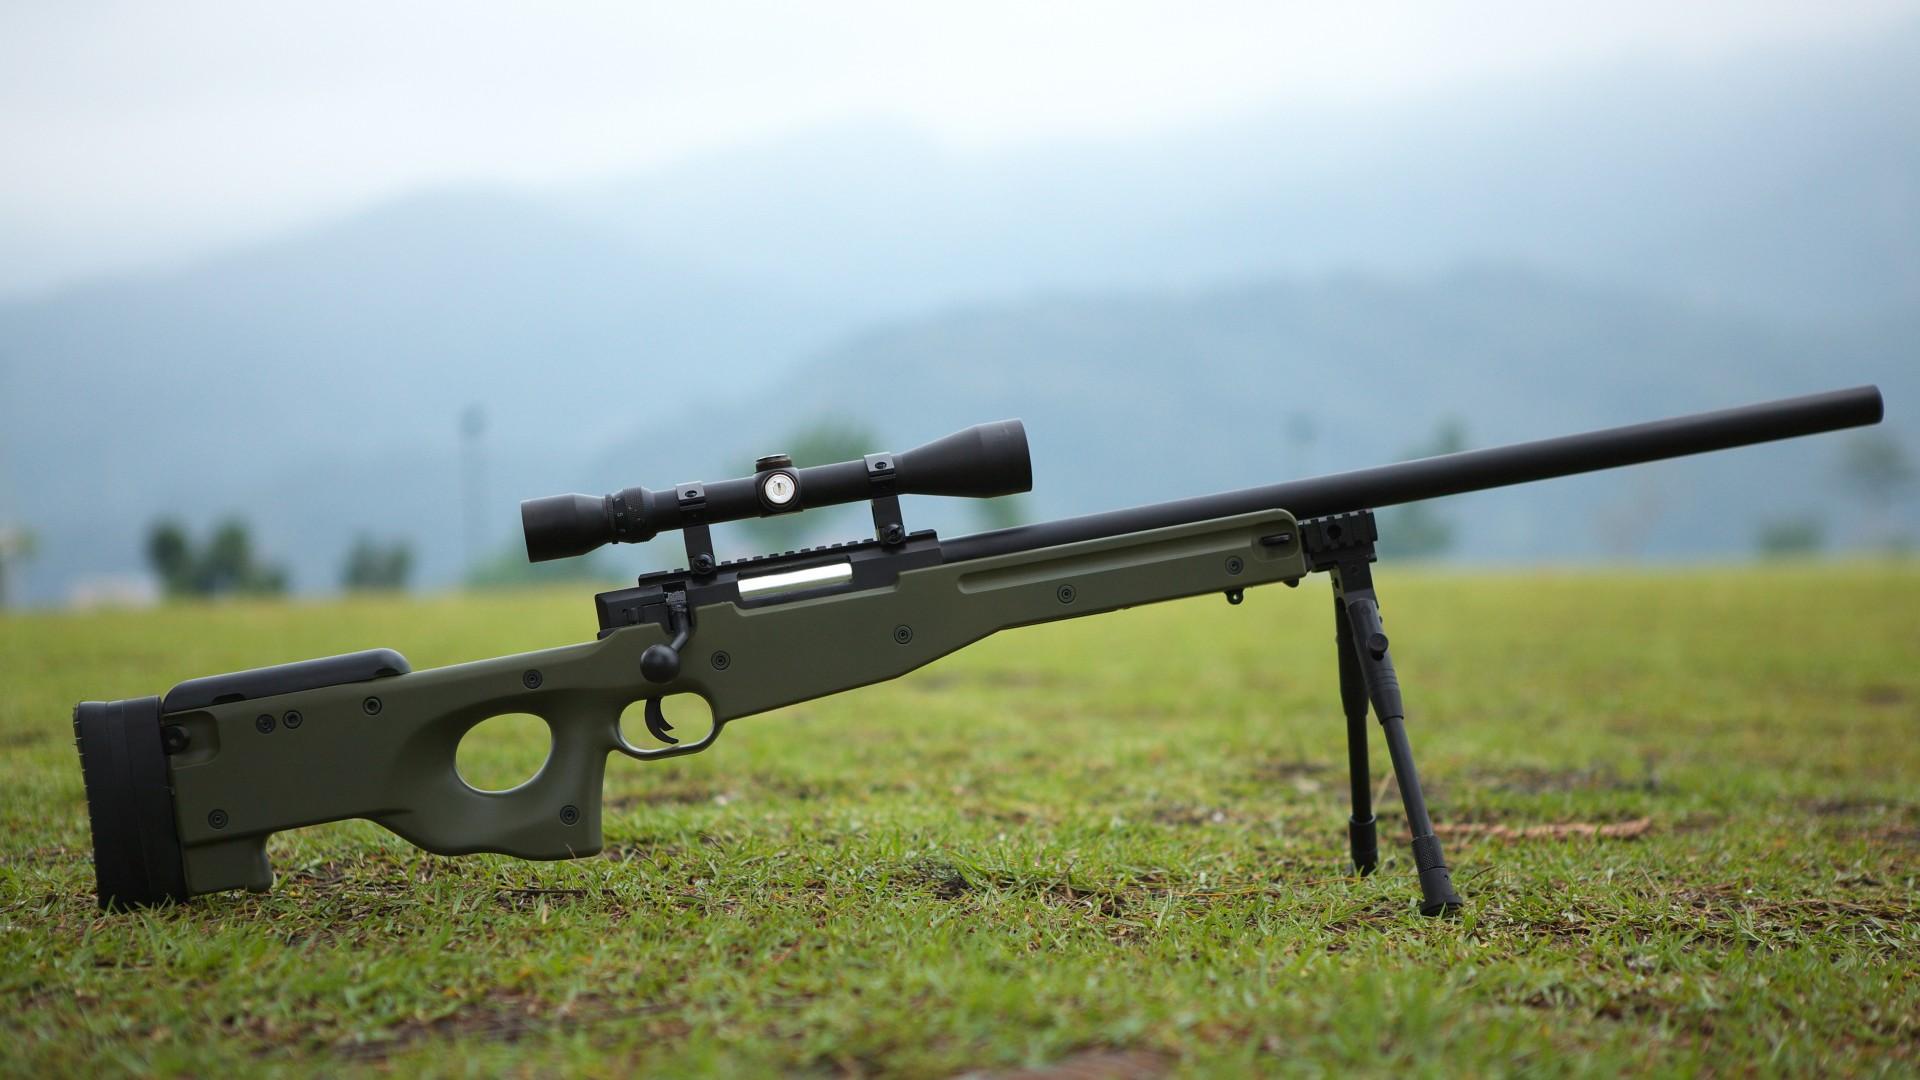 винтовка, приклад, прицел